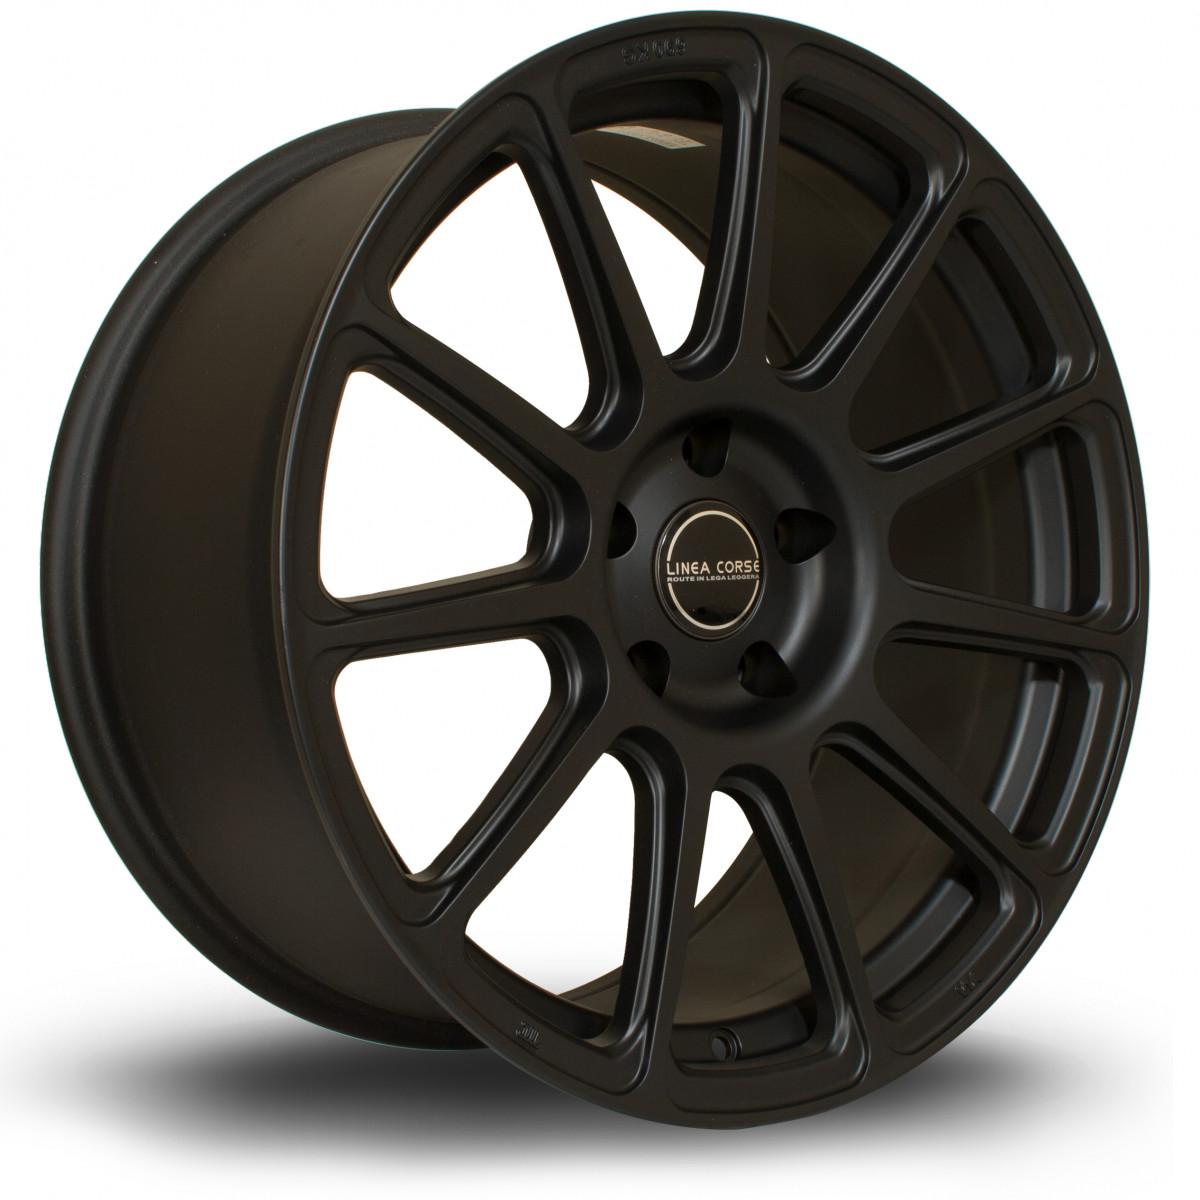 LC888 19x9 5x120 ET25 Flat Black